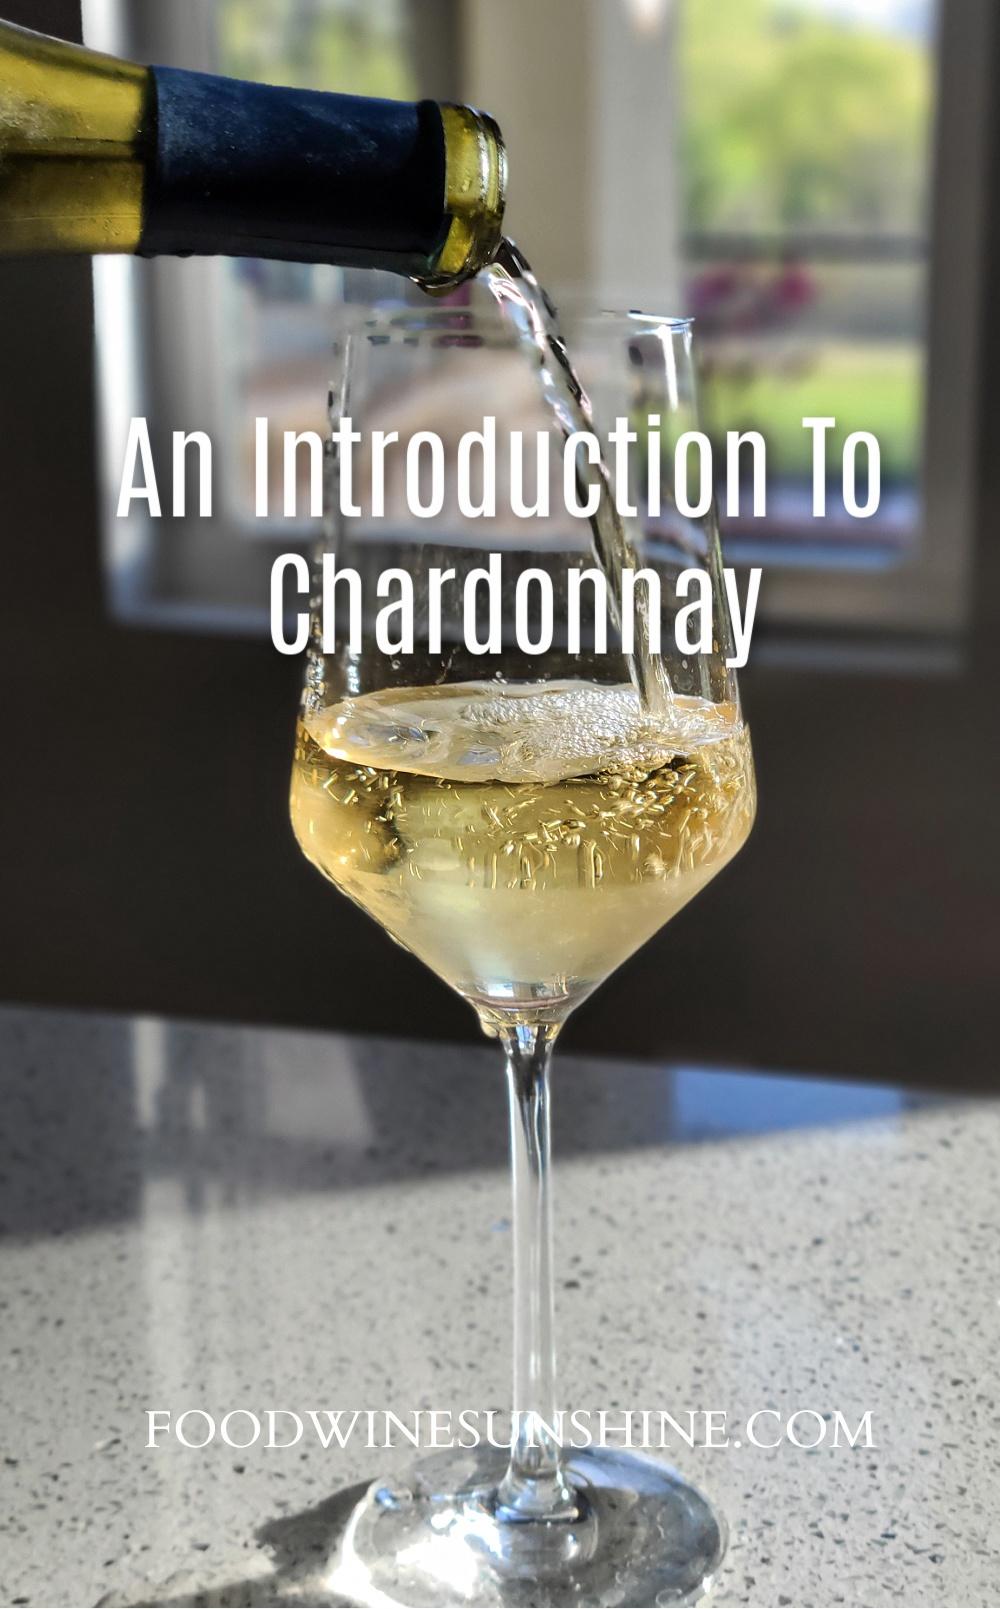 Intro To Chardonnay Wine